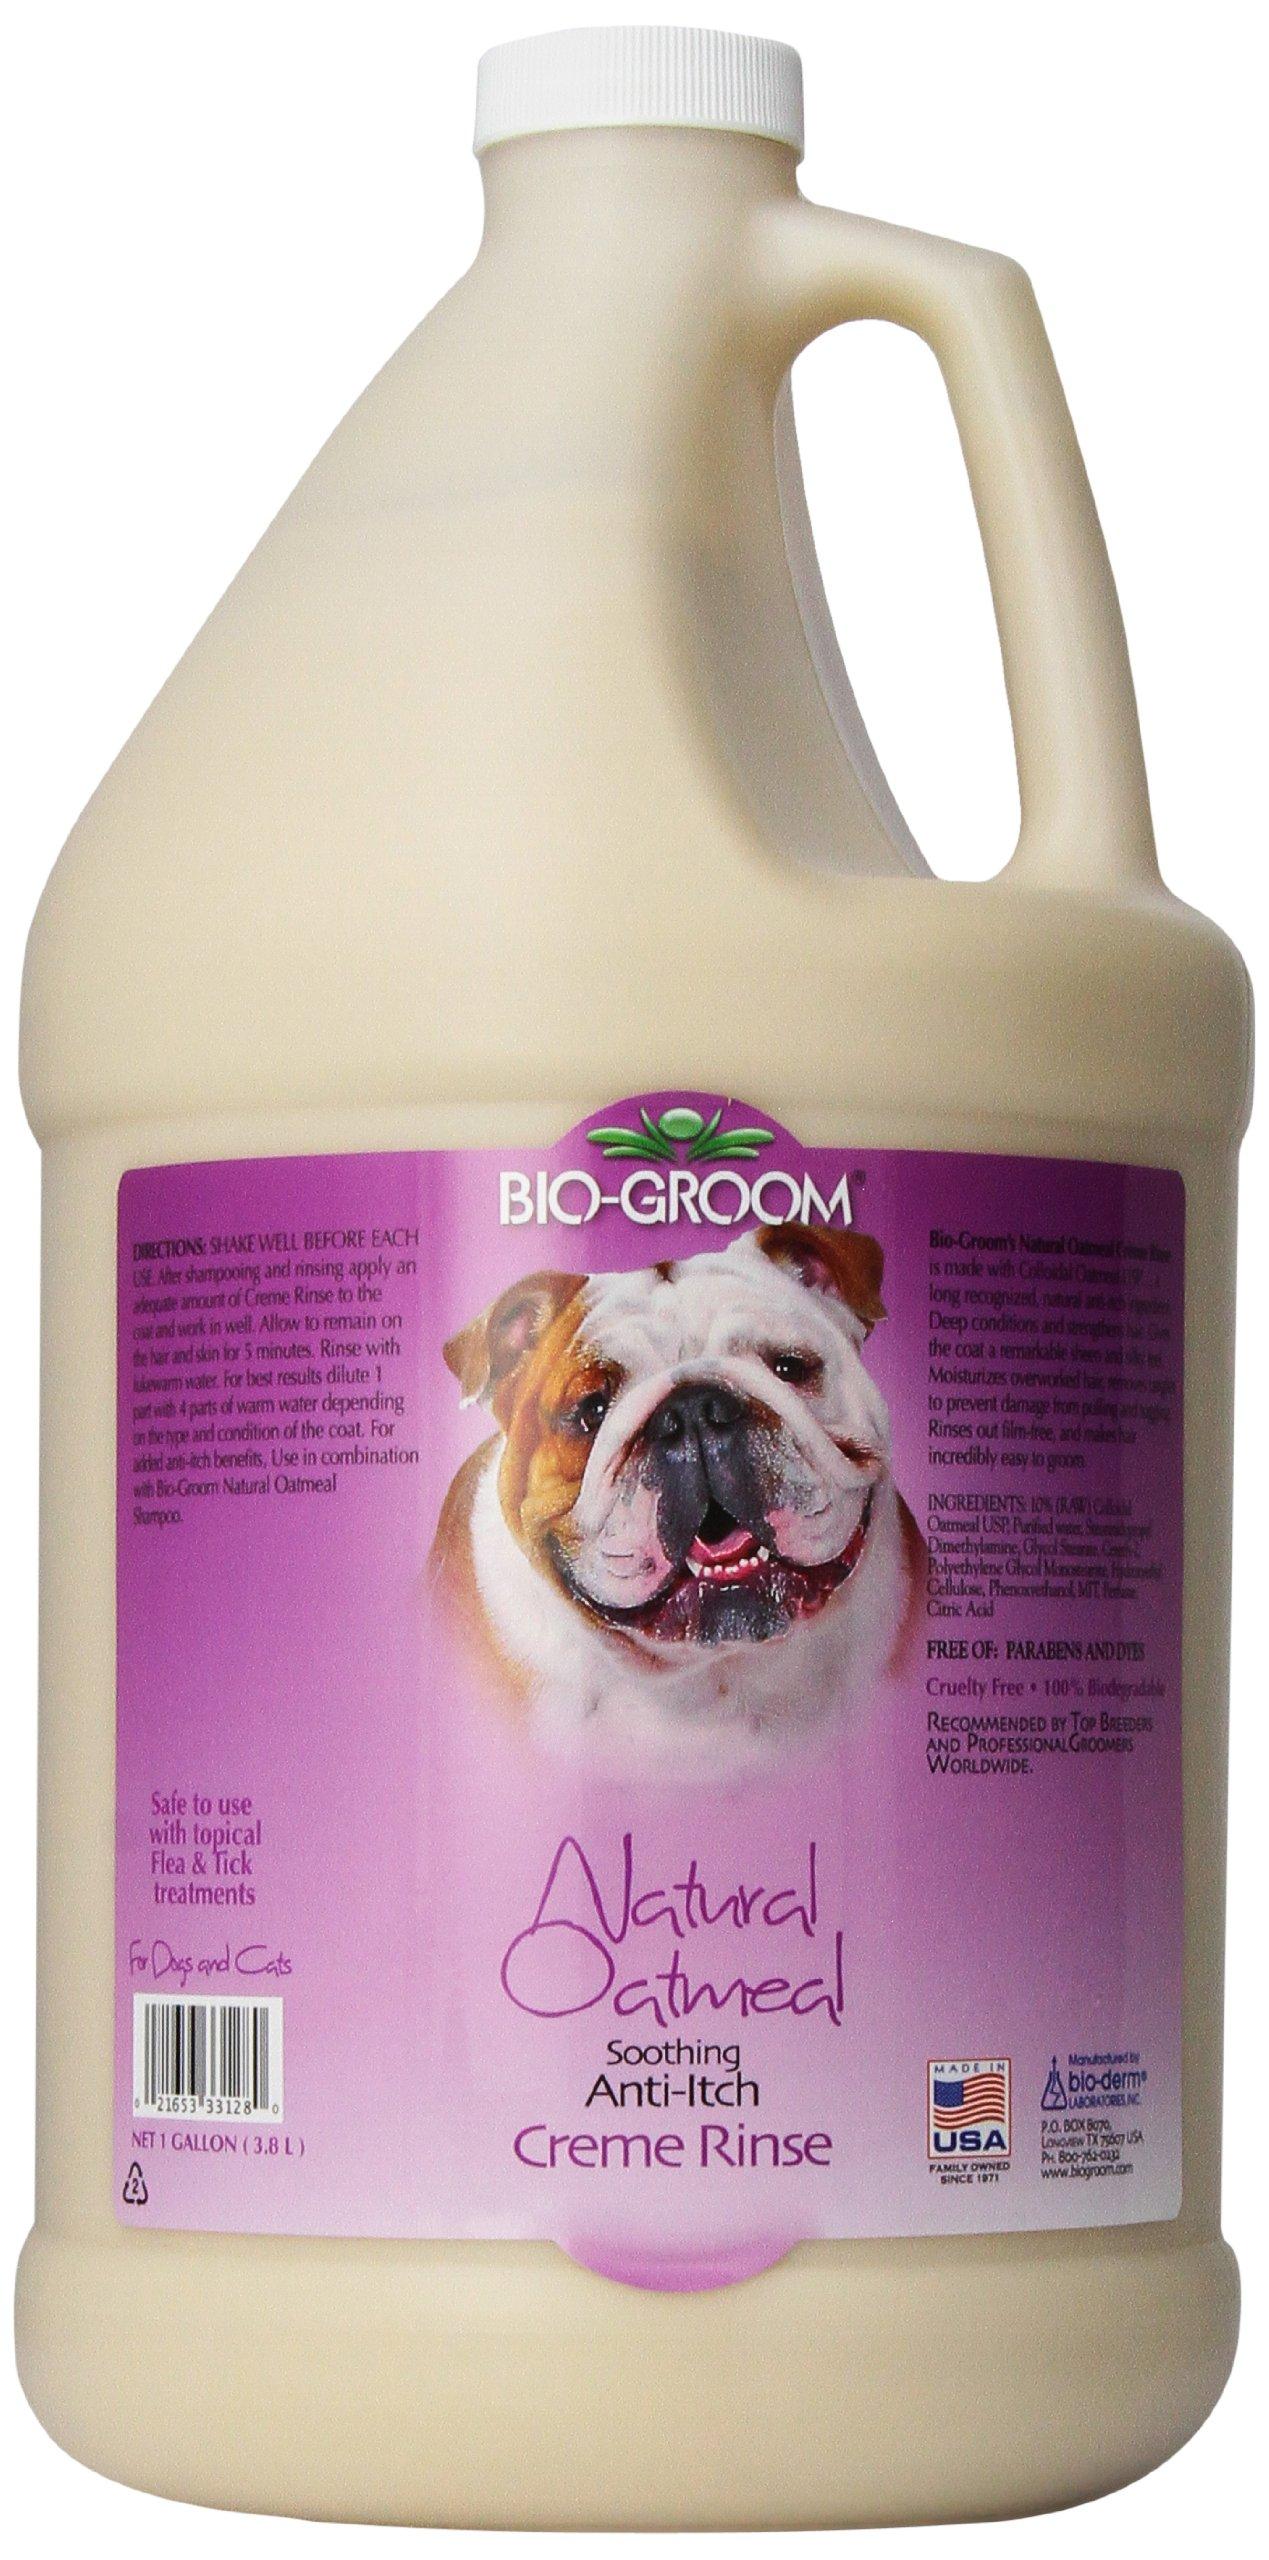 Bio-Groom Natural Oatmeal Anti-Itch Pet Creme Rinse, 1-Gallon by Bio-groom